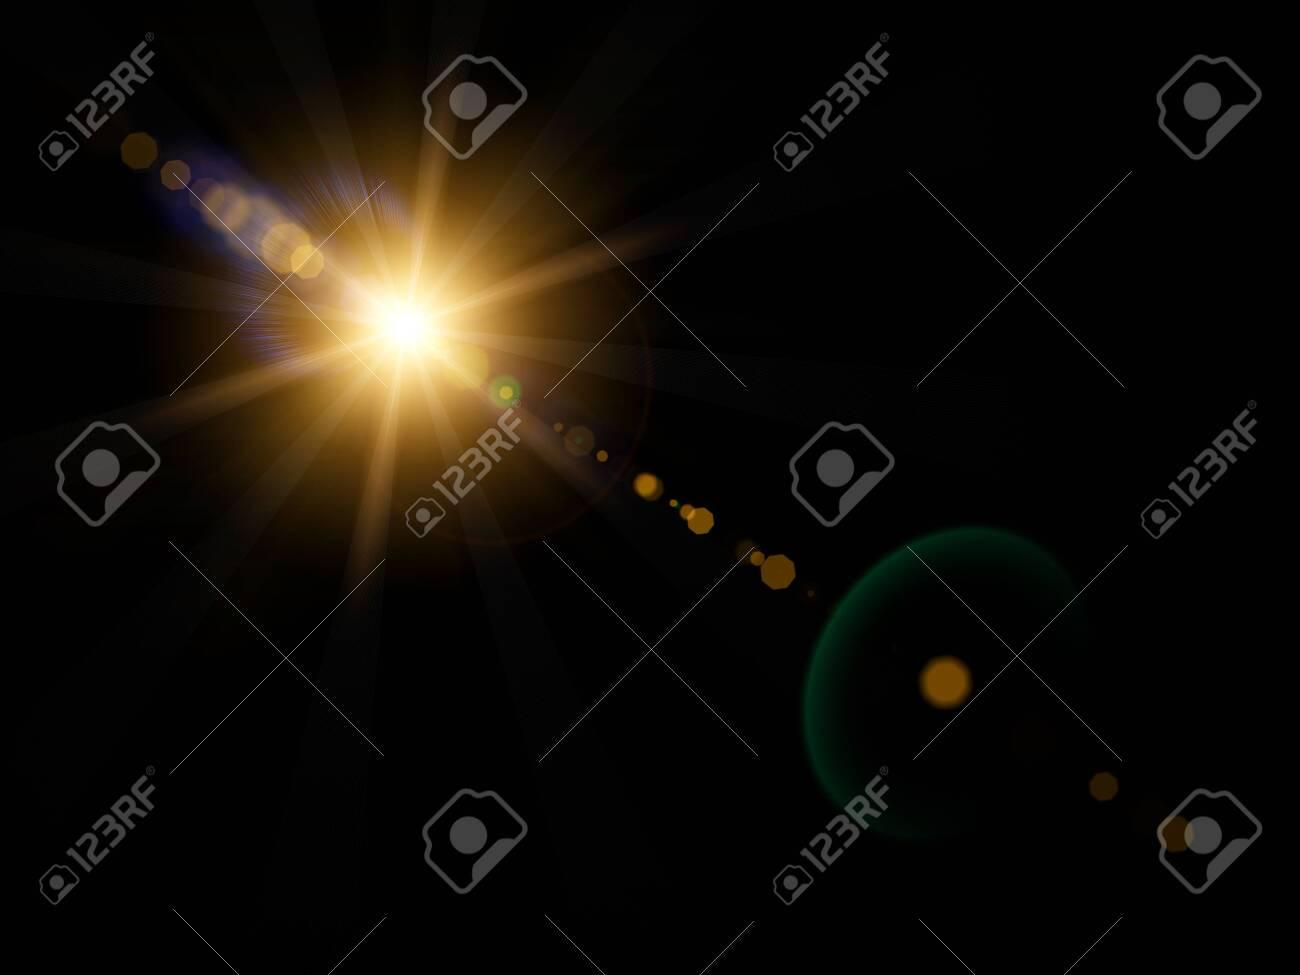 Optical lens flare on black background. - 144933355